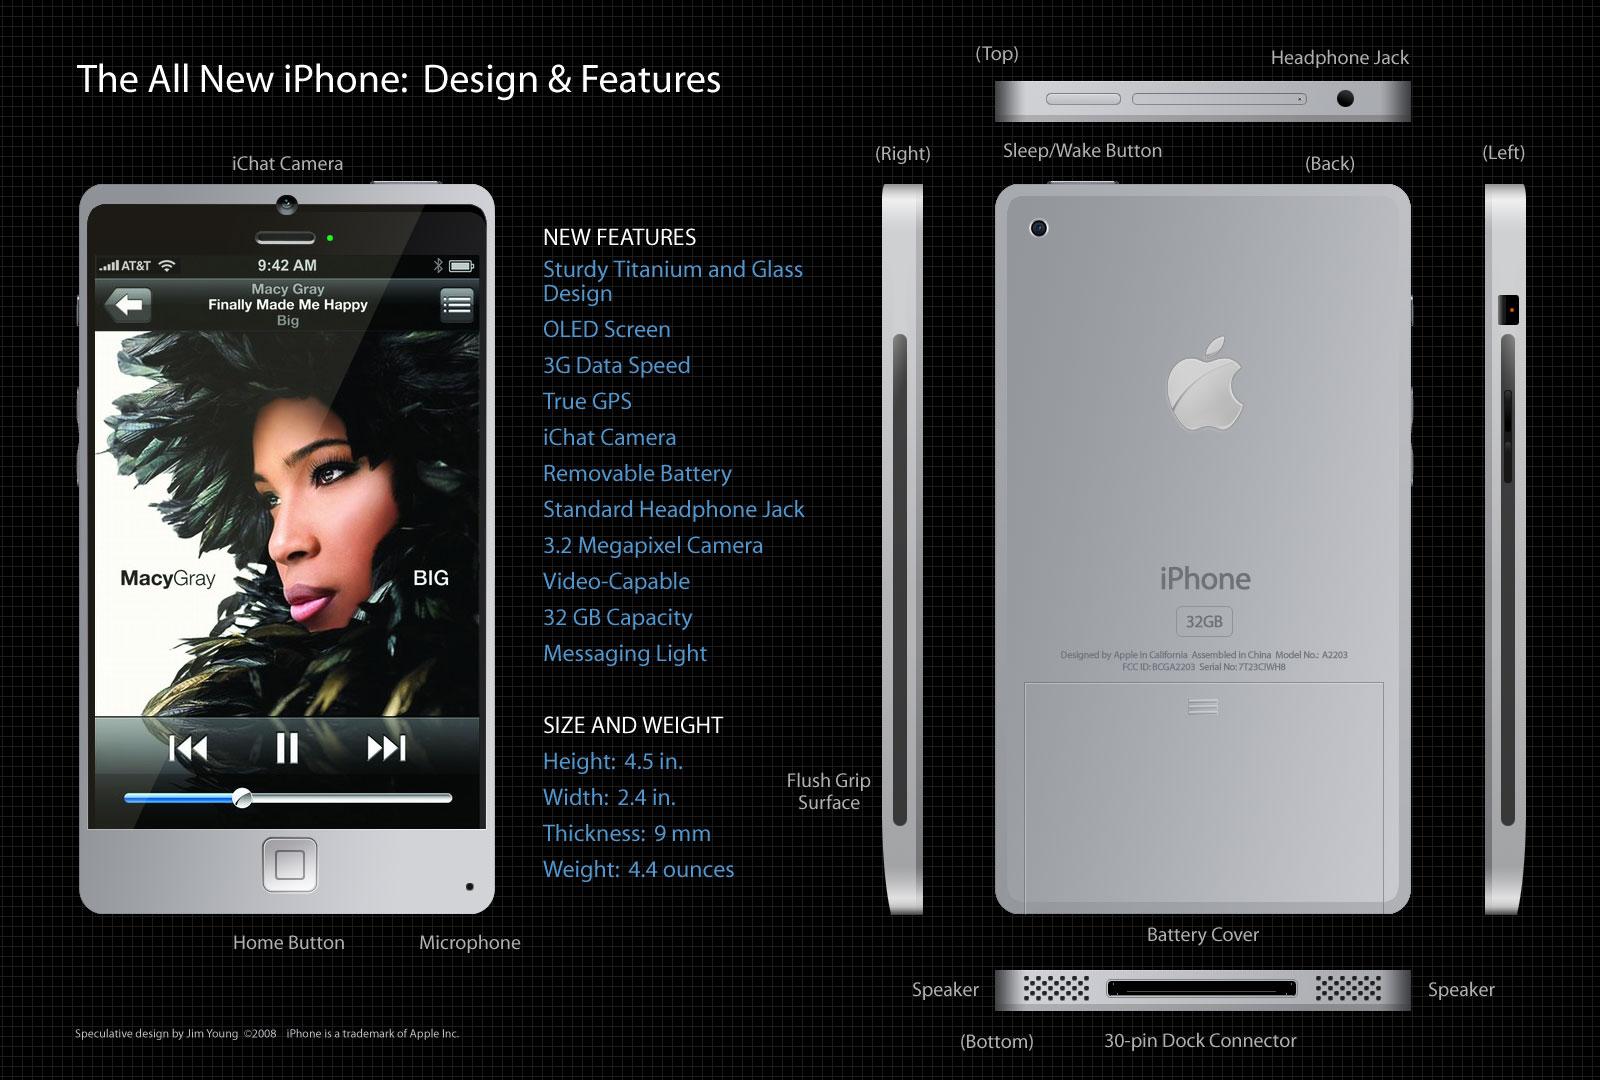 iPhone 4g.